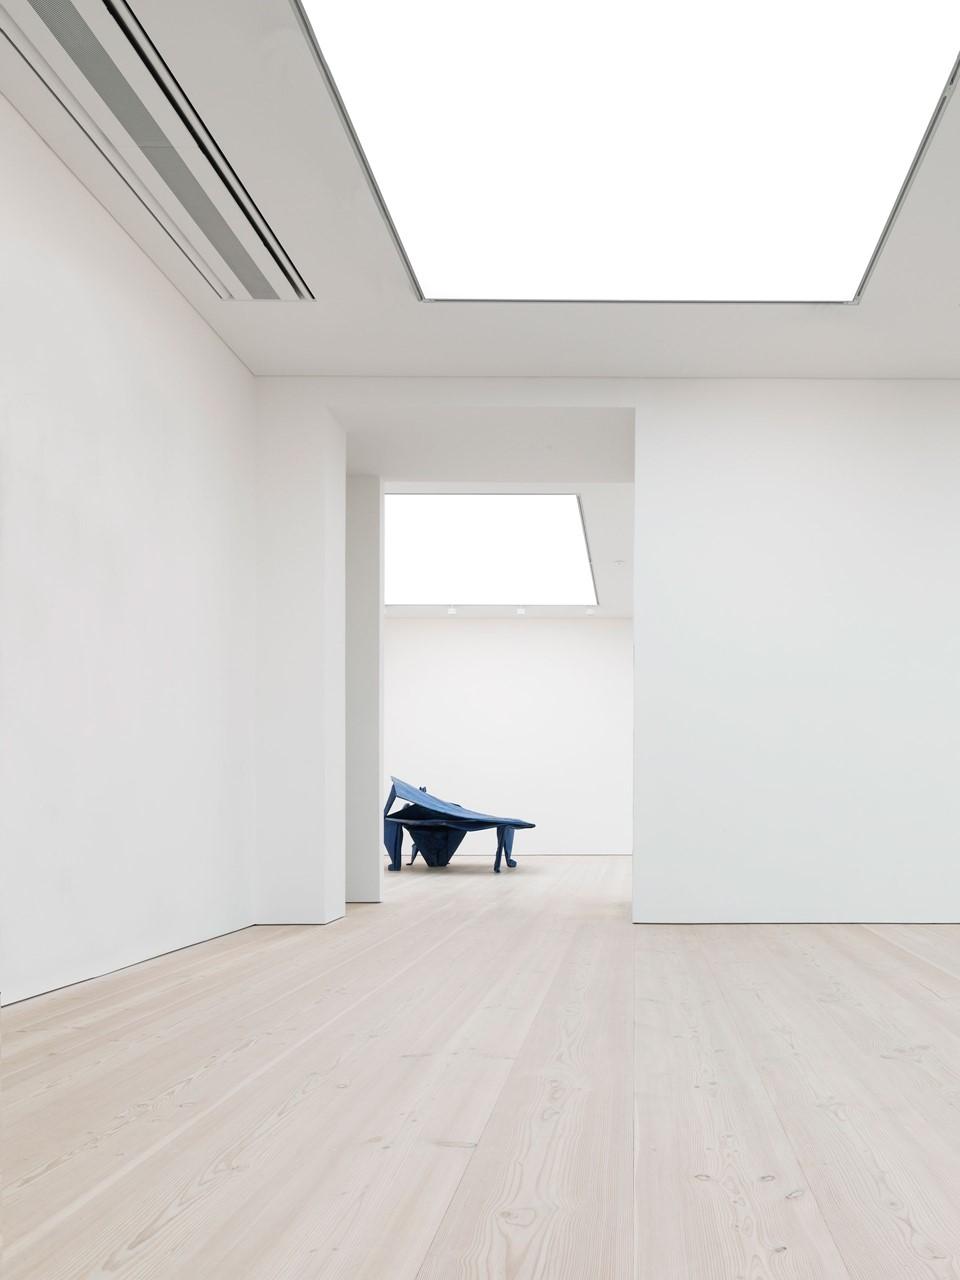 douglas-fir-flooring_lye-white-soap_saatchi-gallery_art_piano_dinesen.jpg